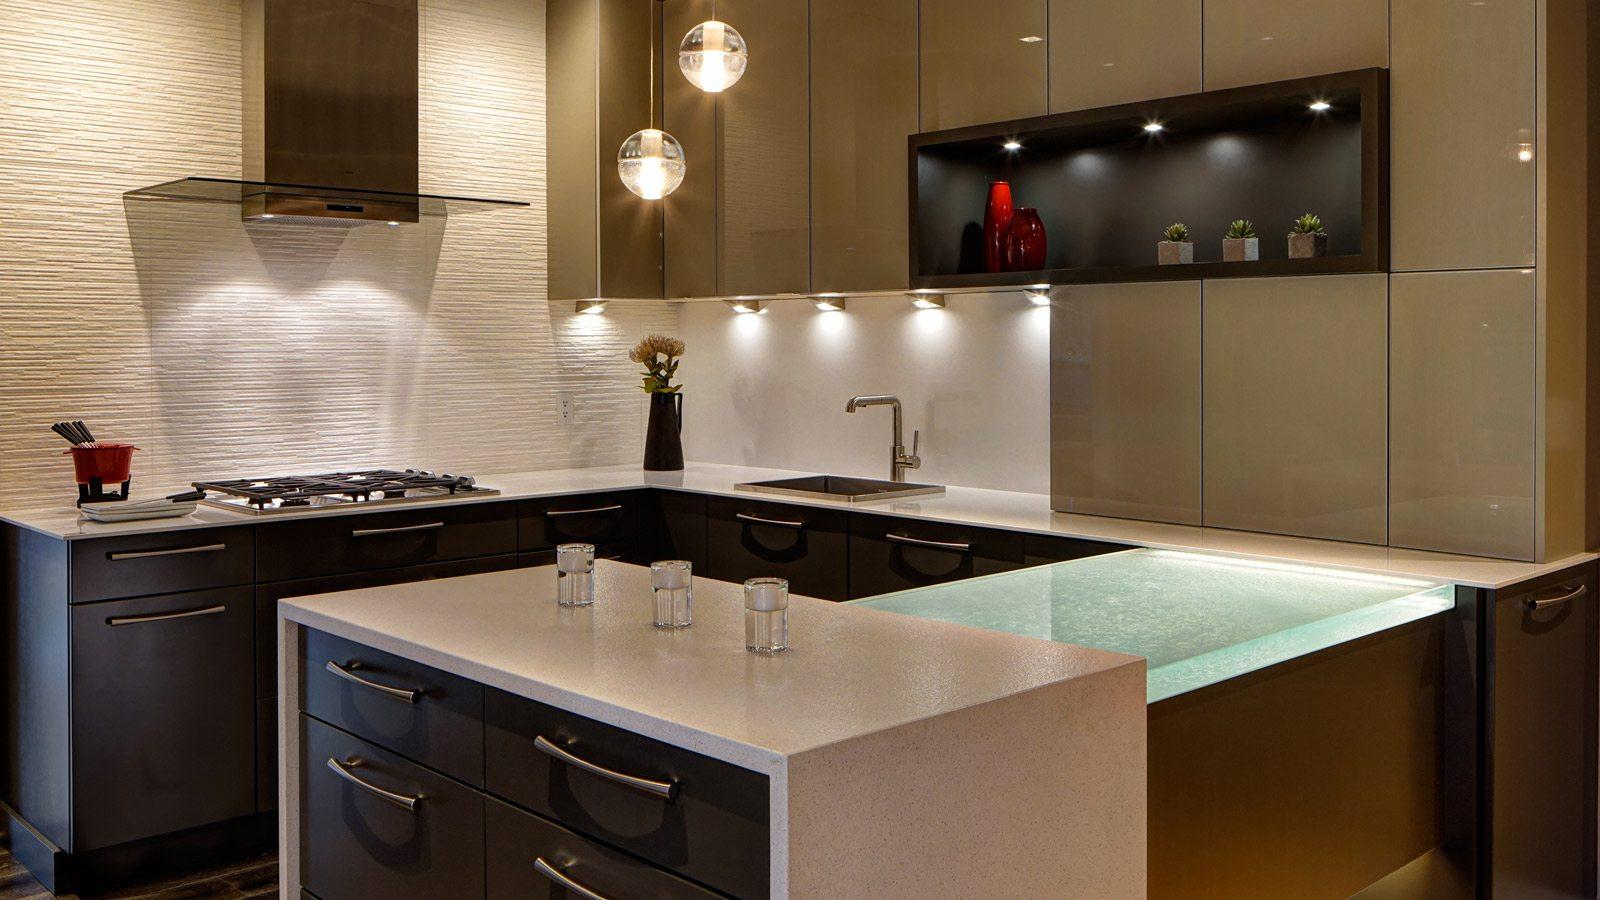 design showroom kitchen and bath design Contemporary Studio Vignette drury design